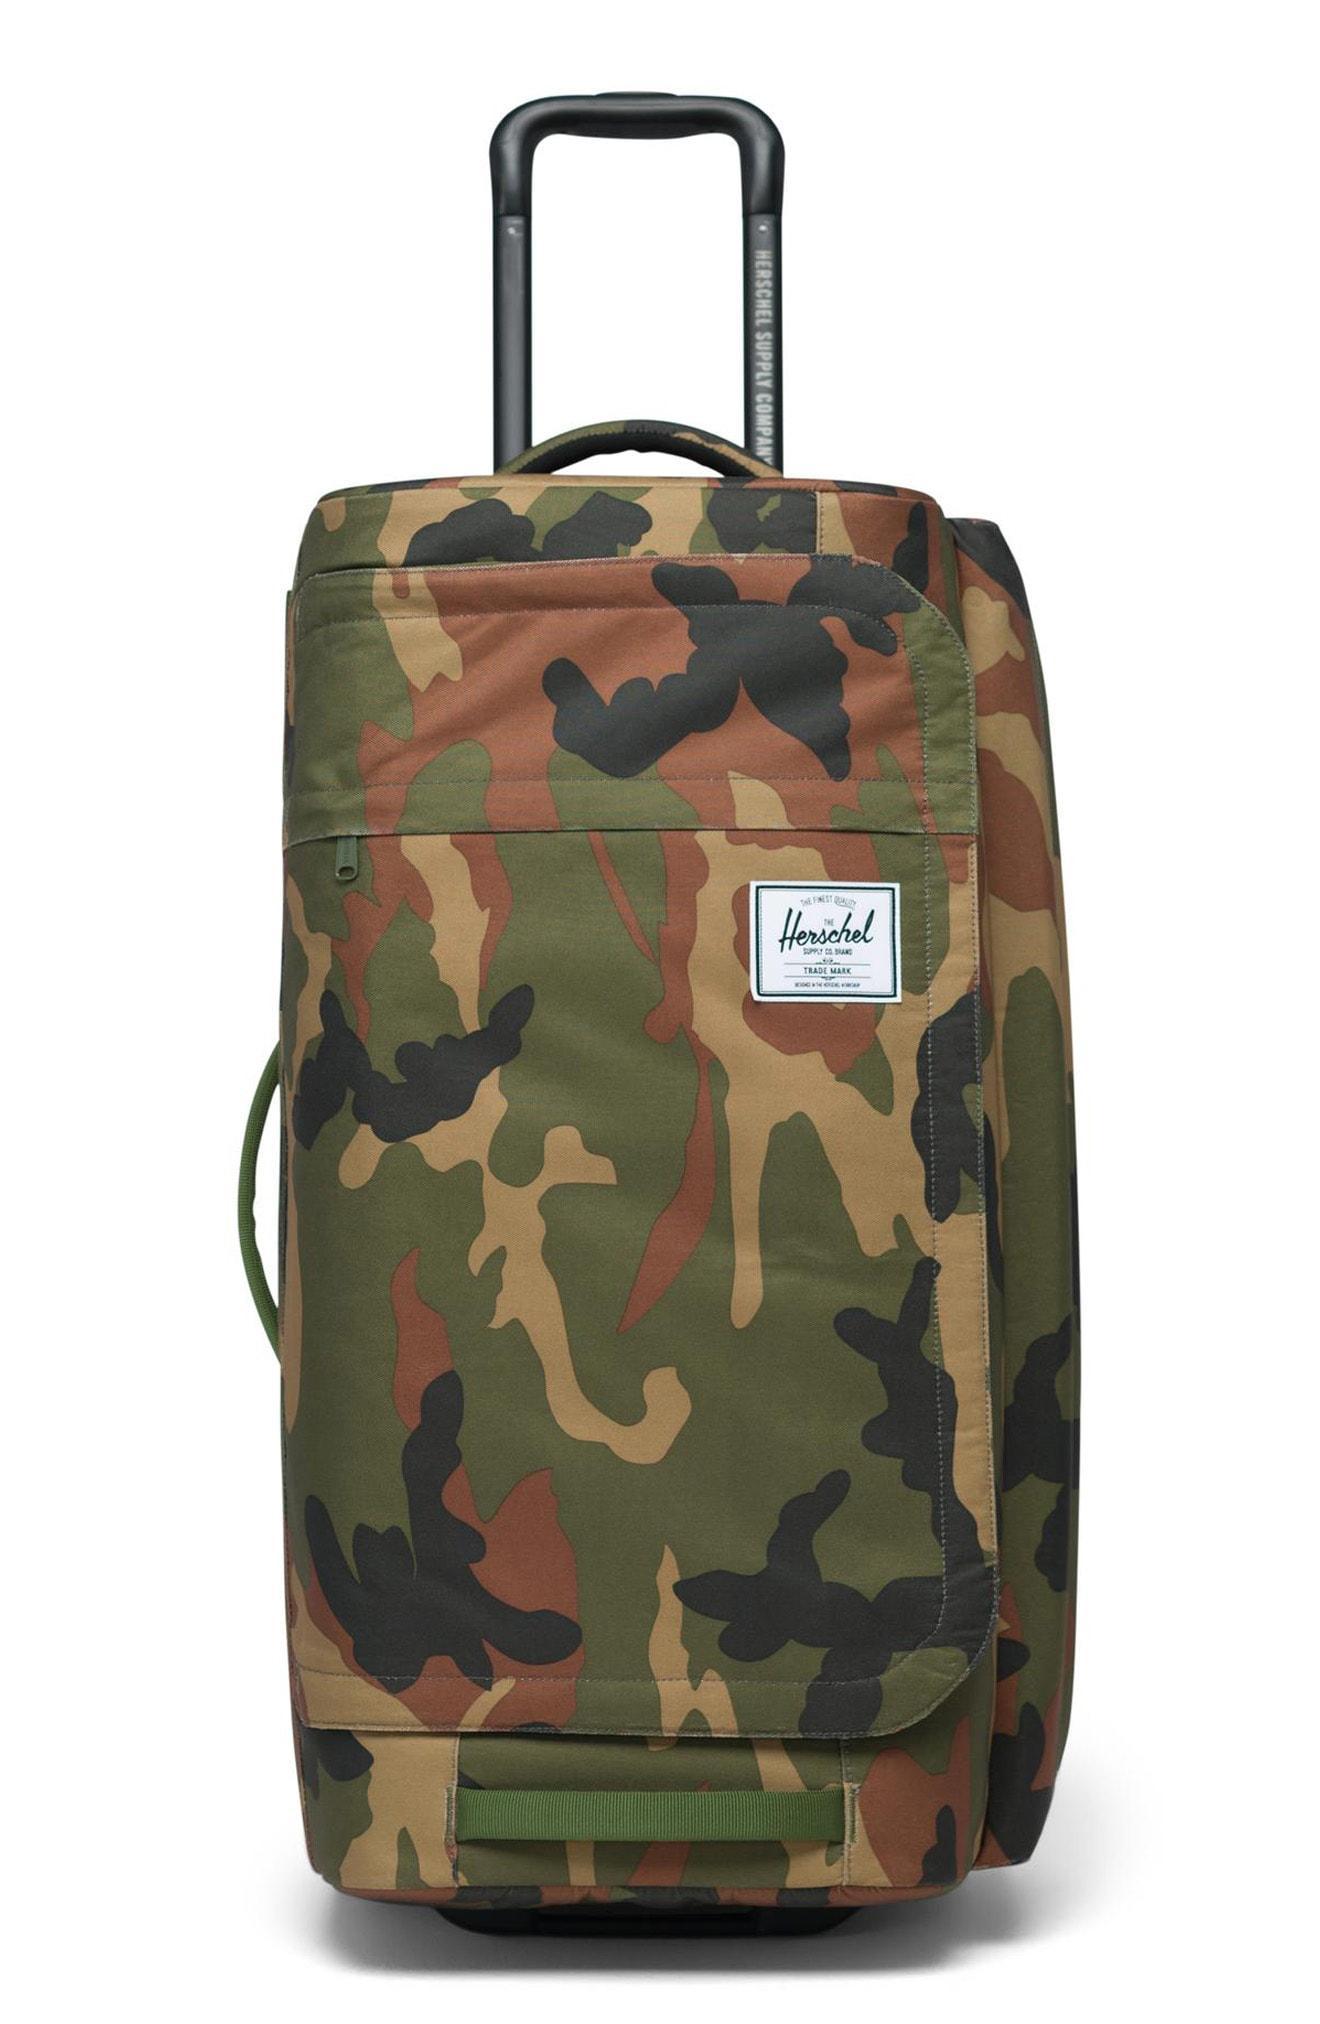 Lyst - Herschel Supply Co. Wheelie Outfitter 24-inch Duffel Bag in ... 94b292b495